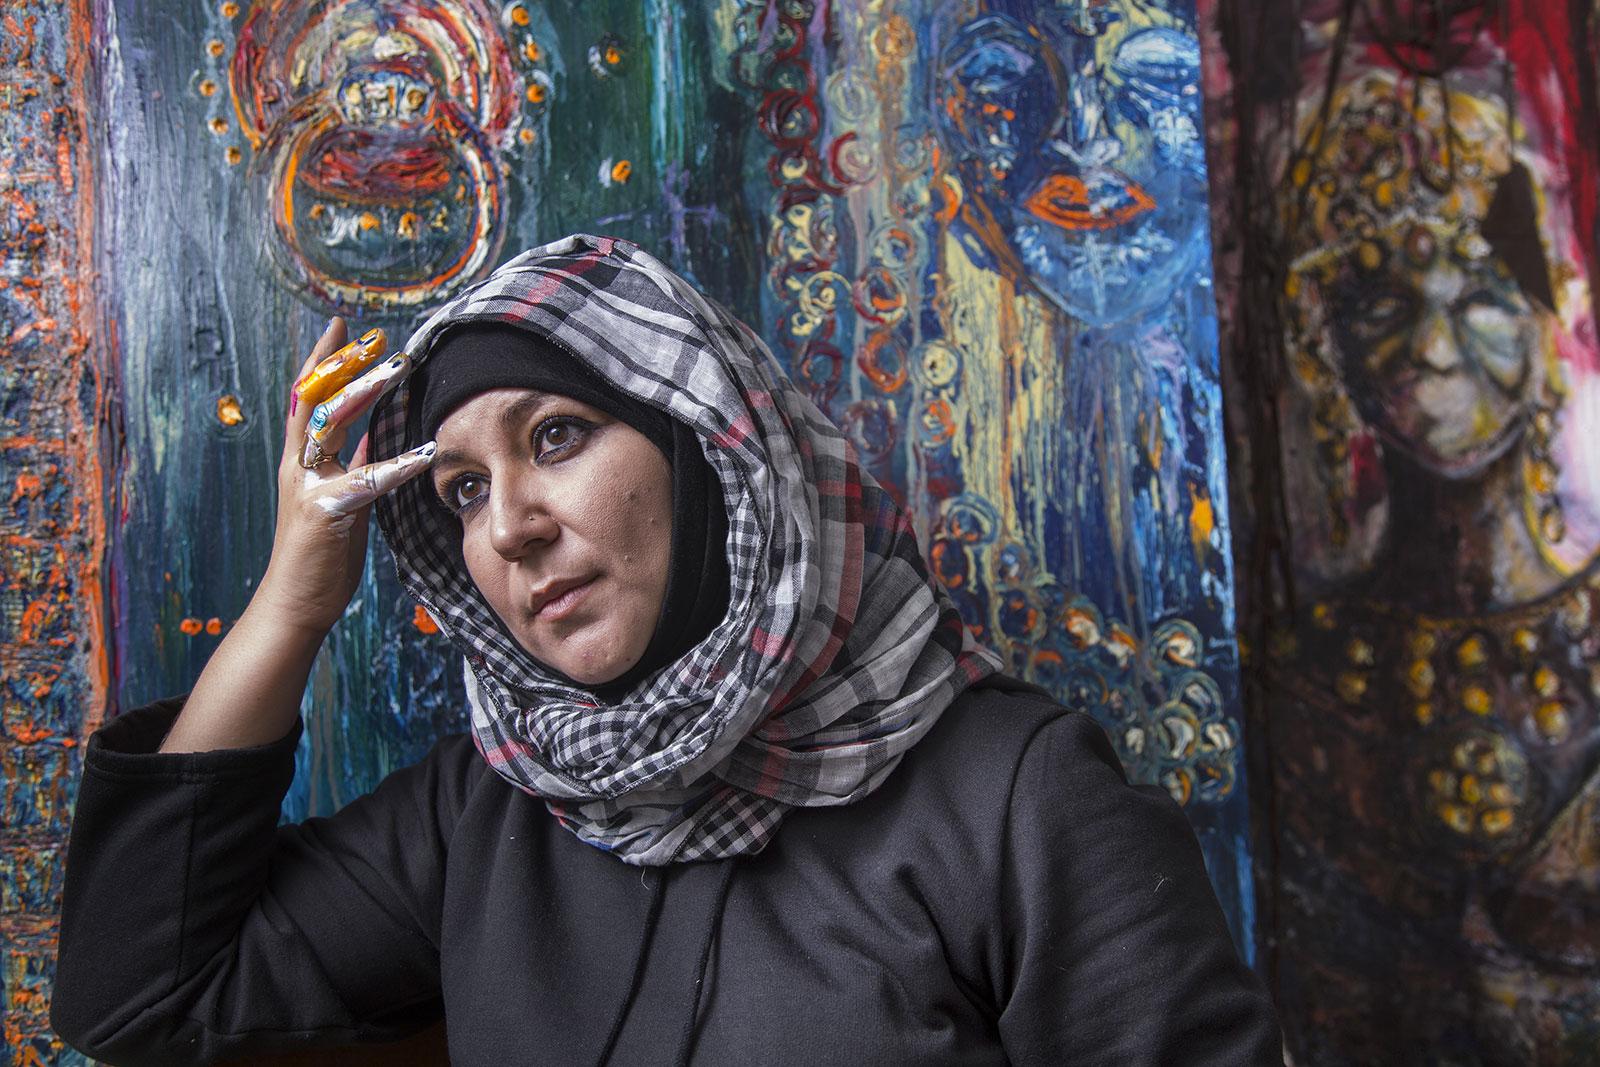 Site de rencontre musulmans au canada